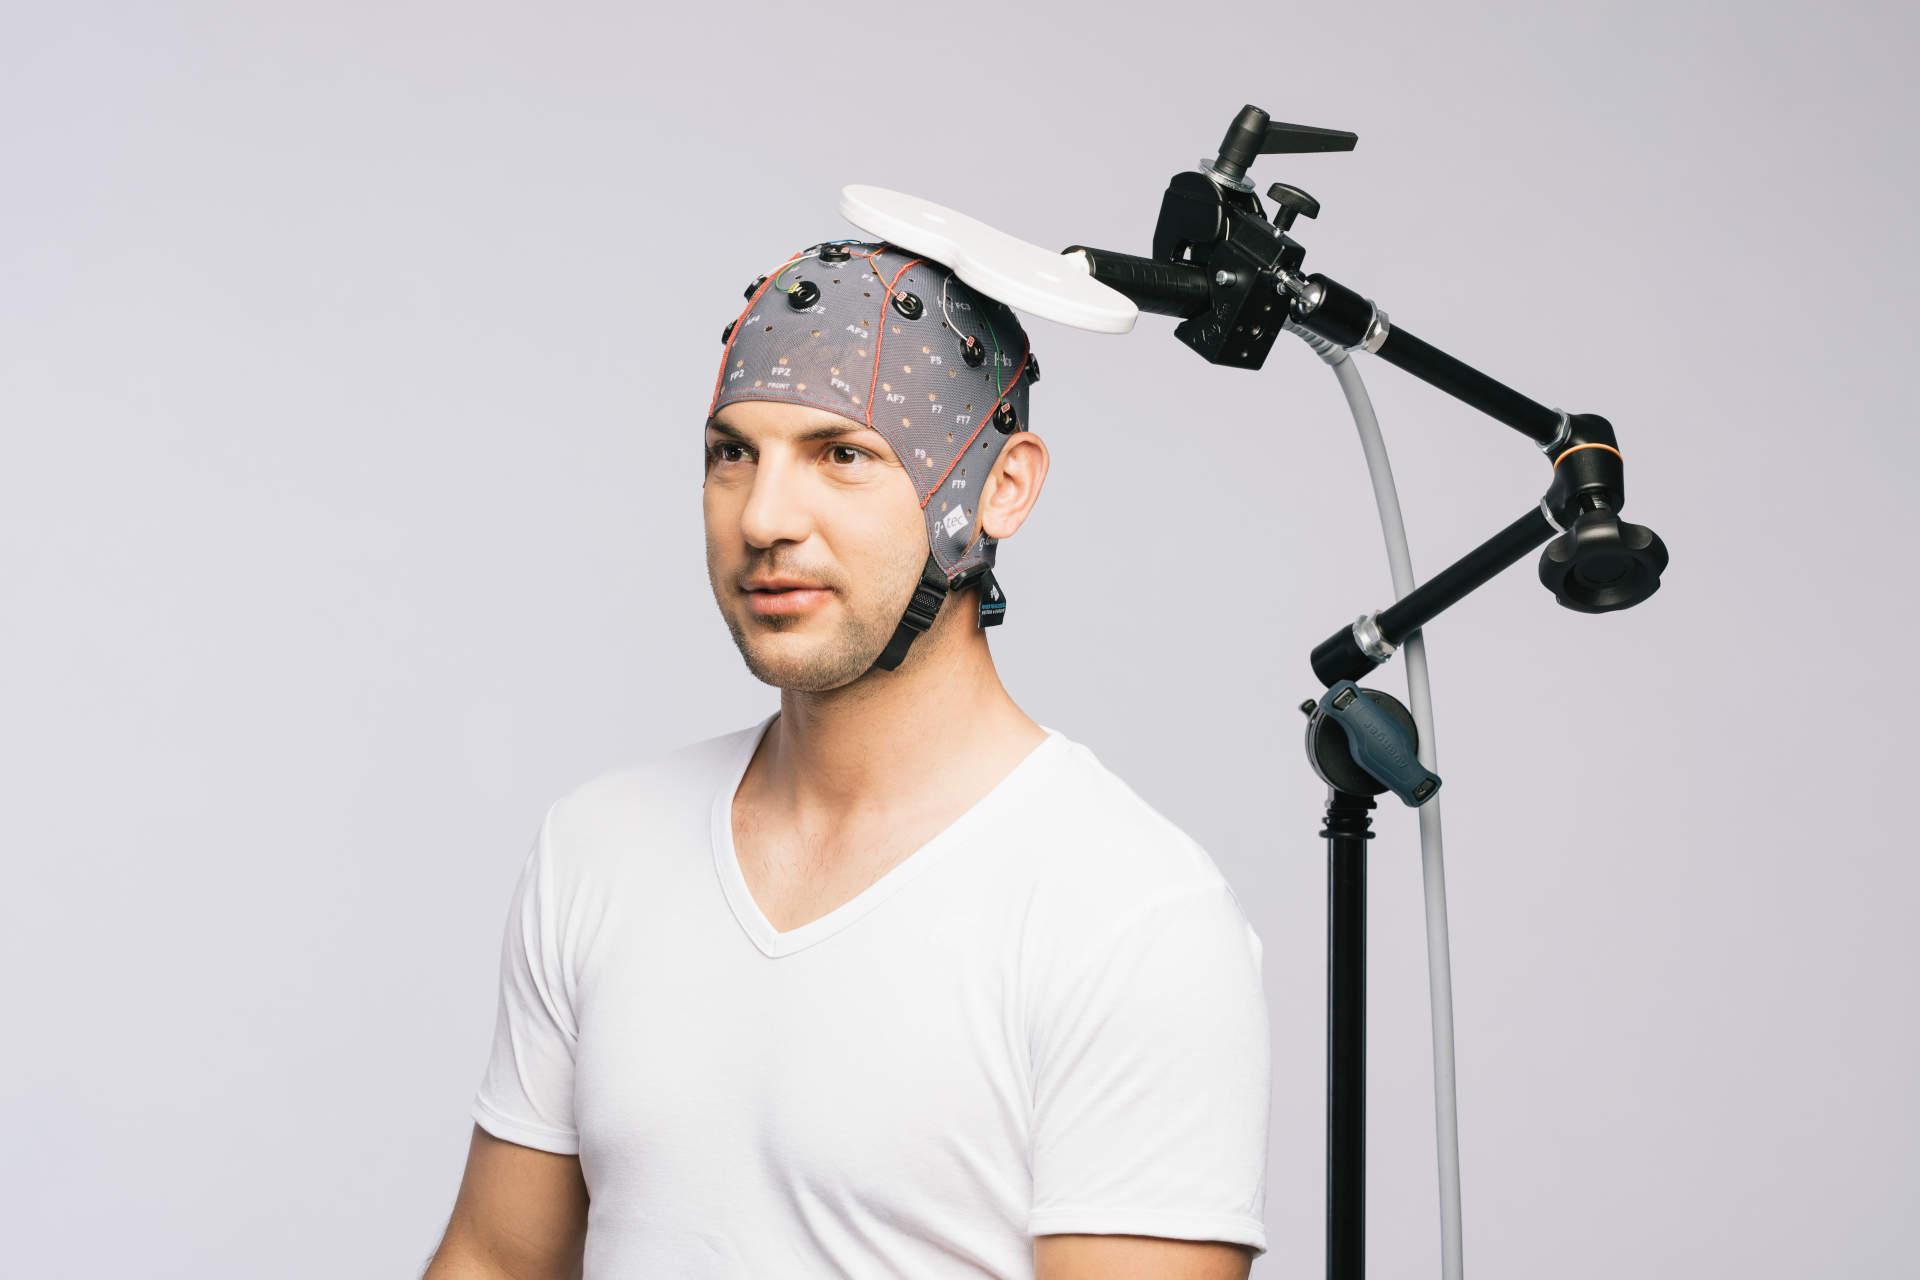 g.Nautilus EEG recordings with TMS